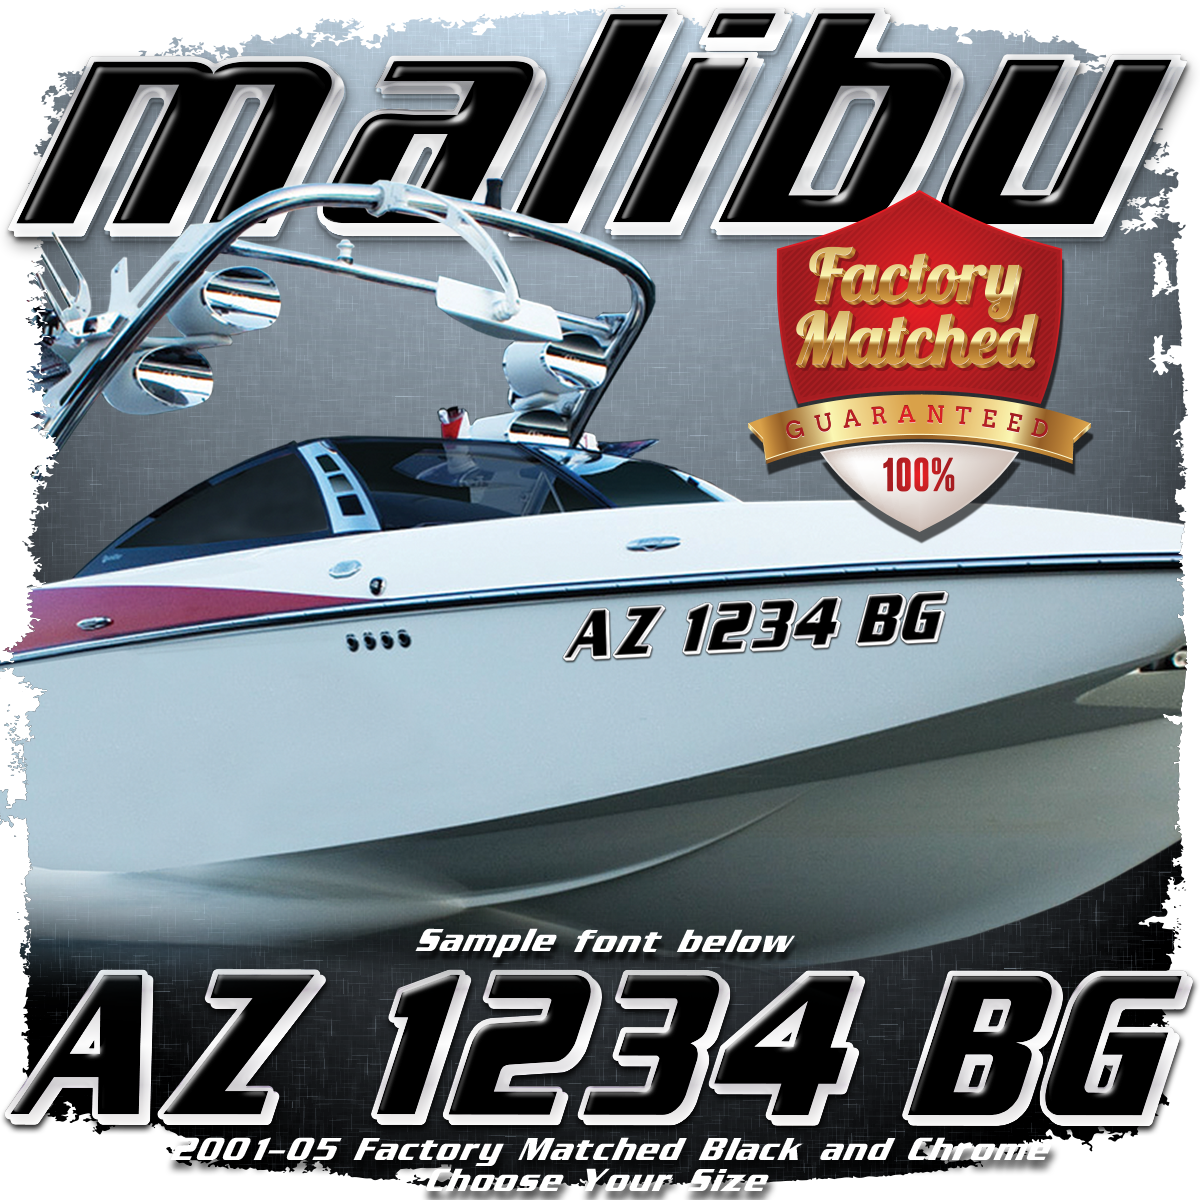 Malibu Registration, 2001-05 Black & Chrome w/ Shadow Factory Match (2 included)